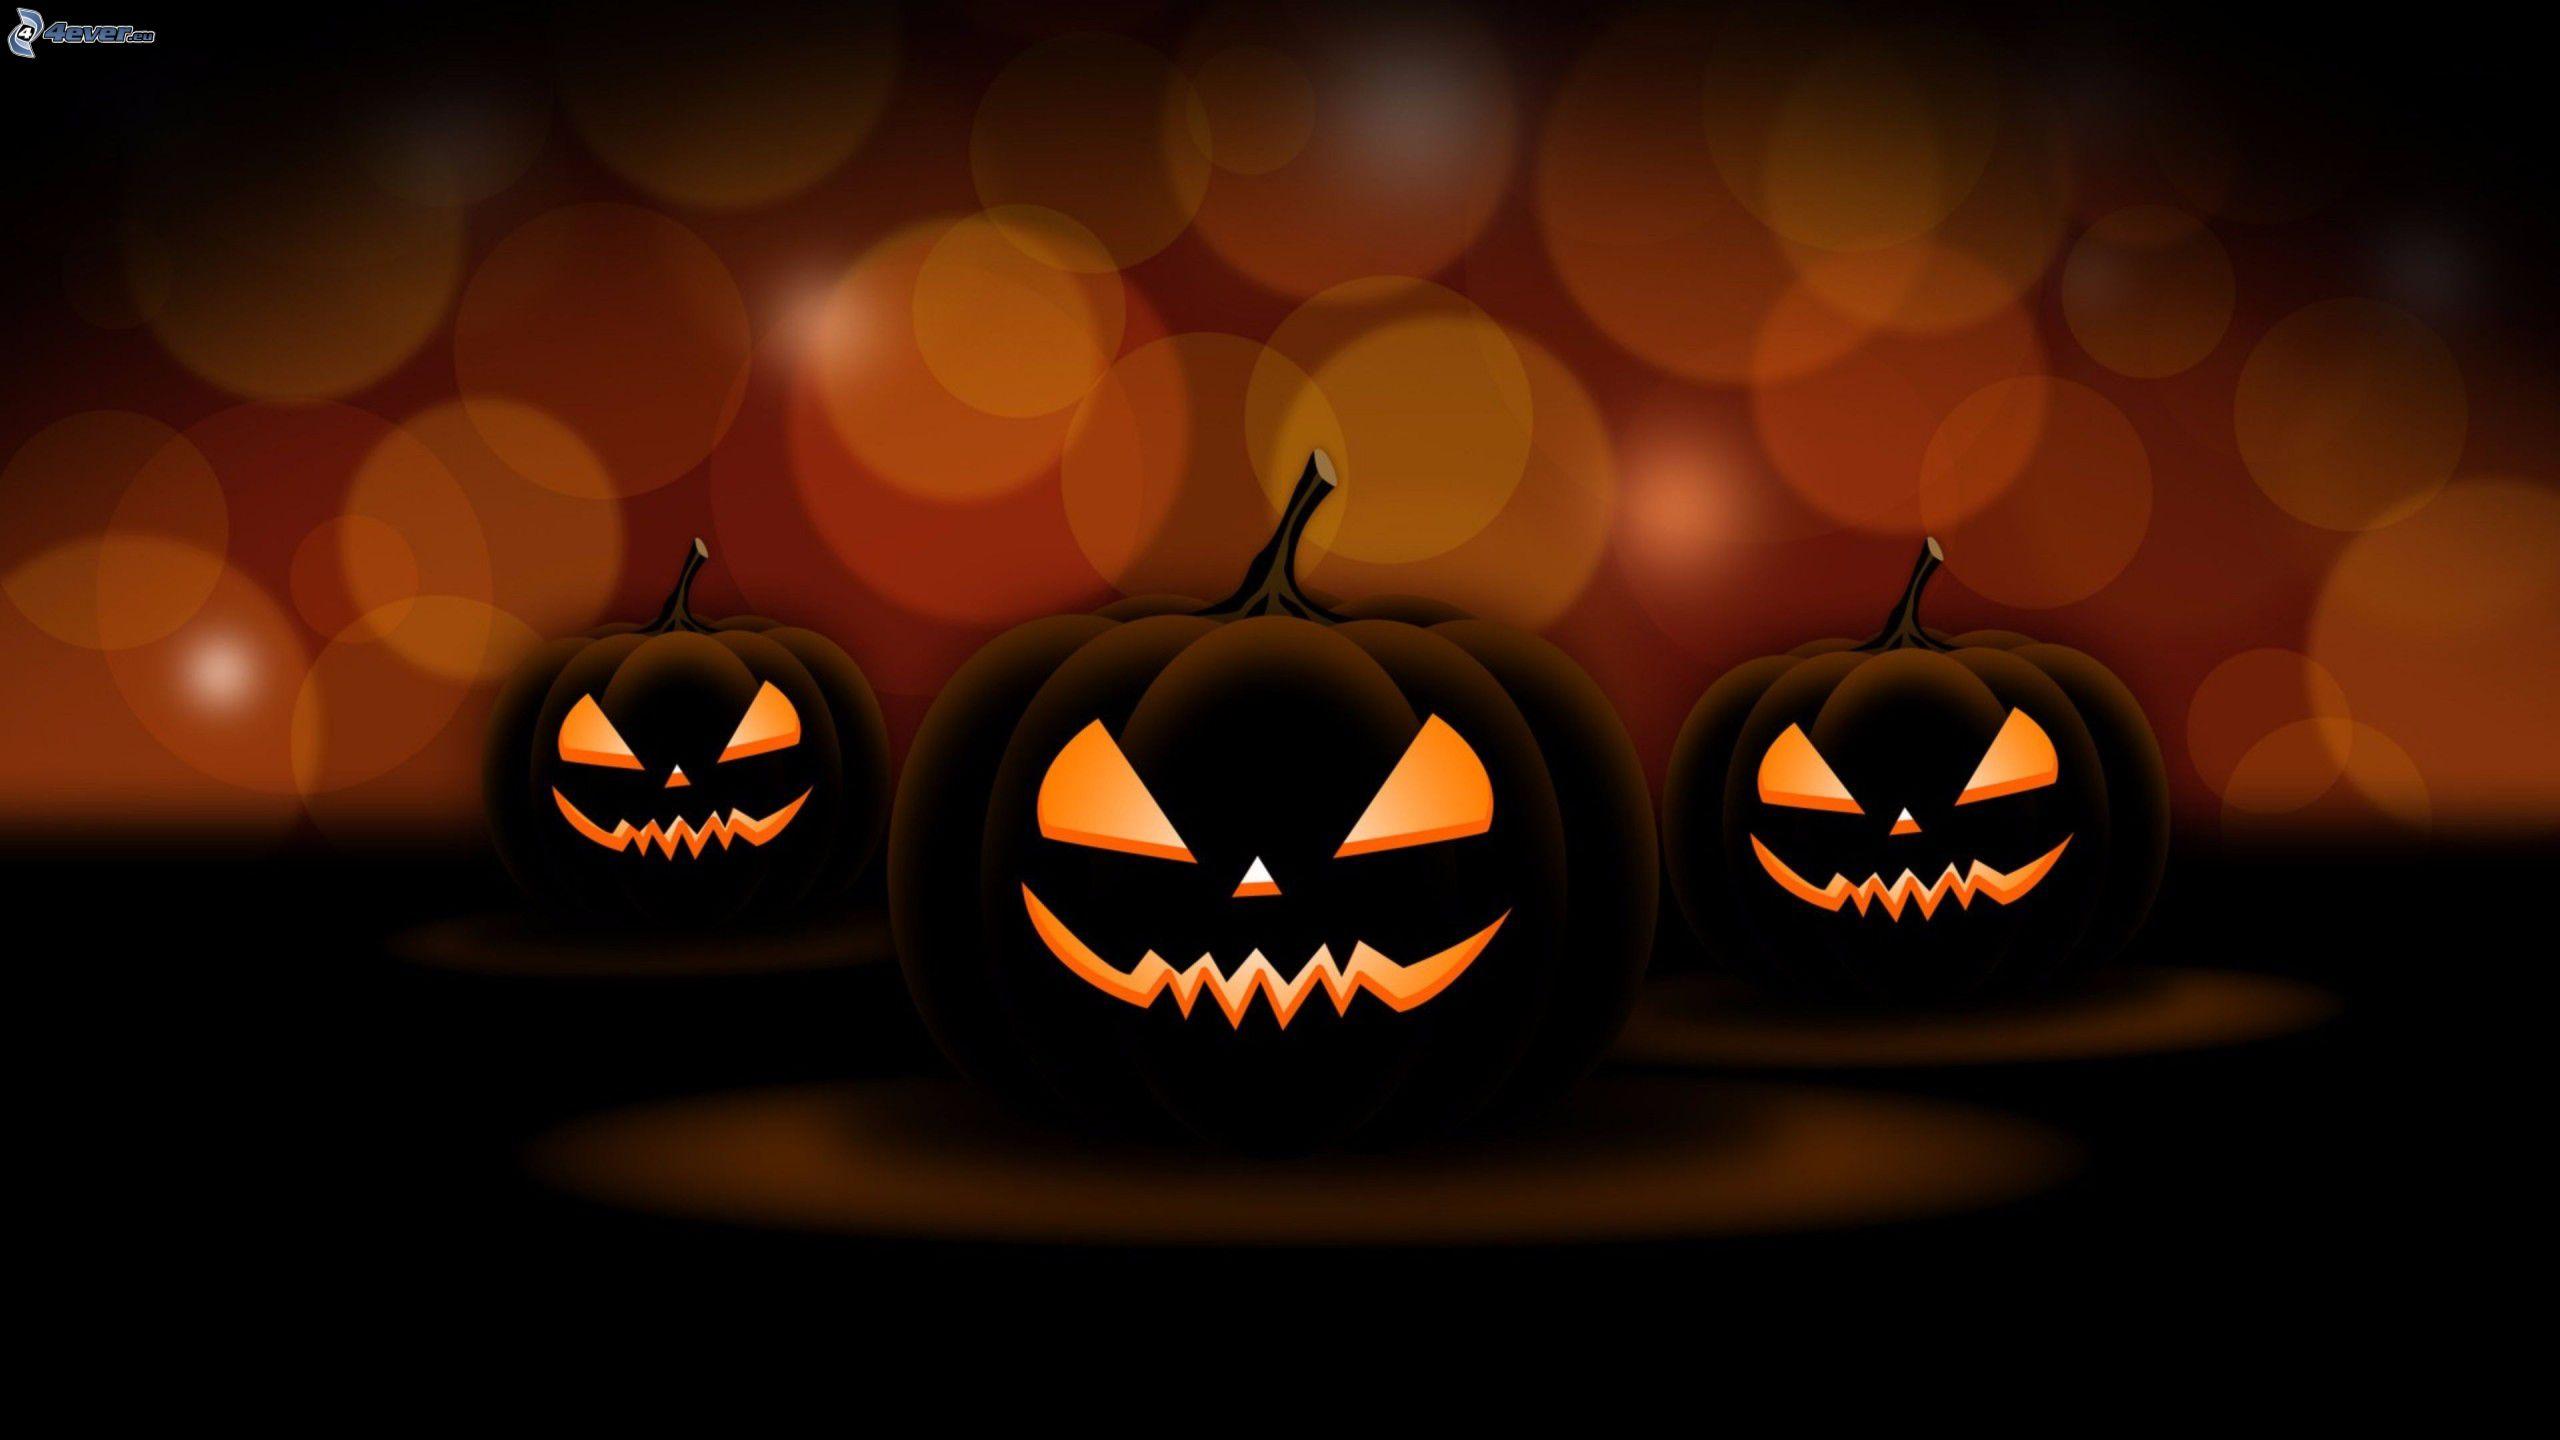 Zucche Di Halloween Cartoni Animati.Zucche Di Halloween